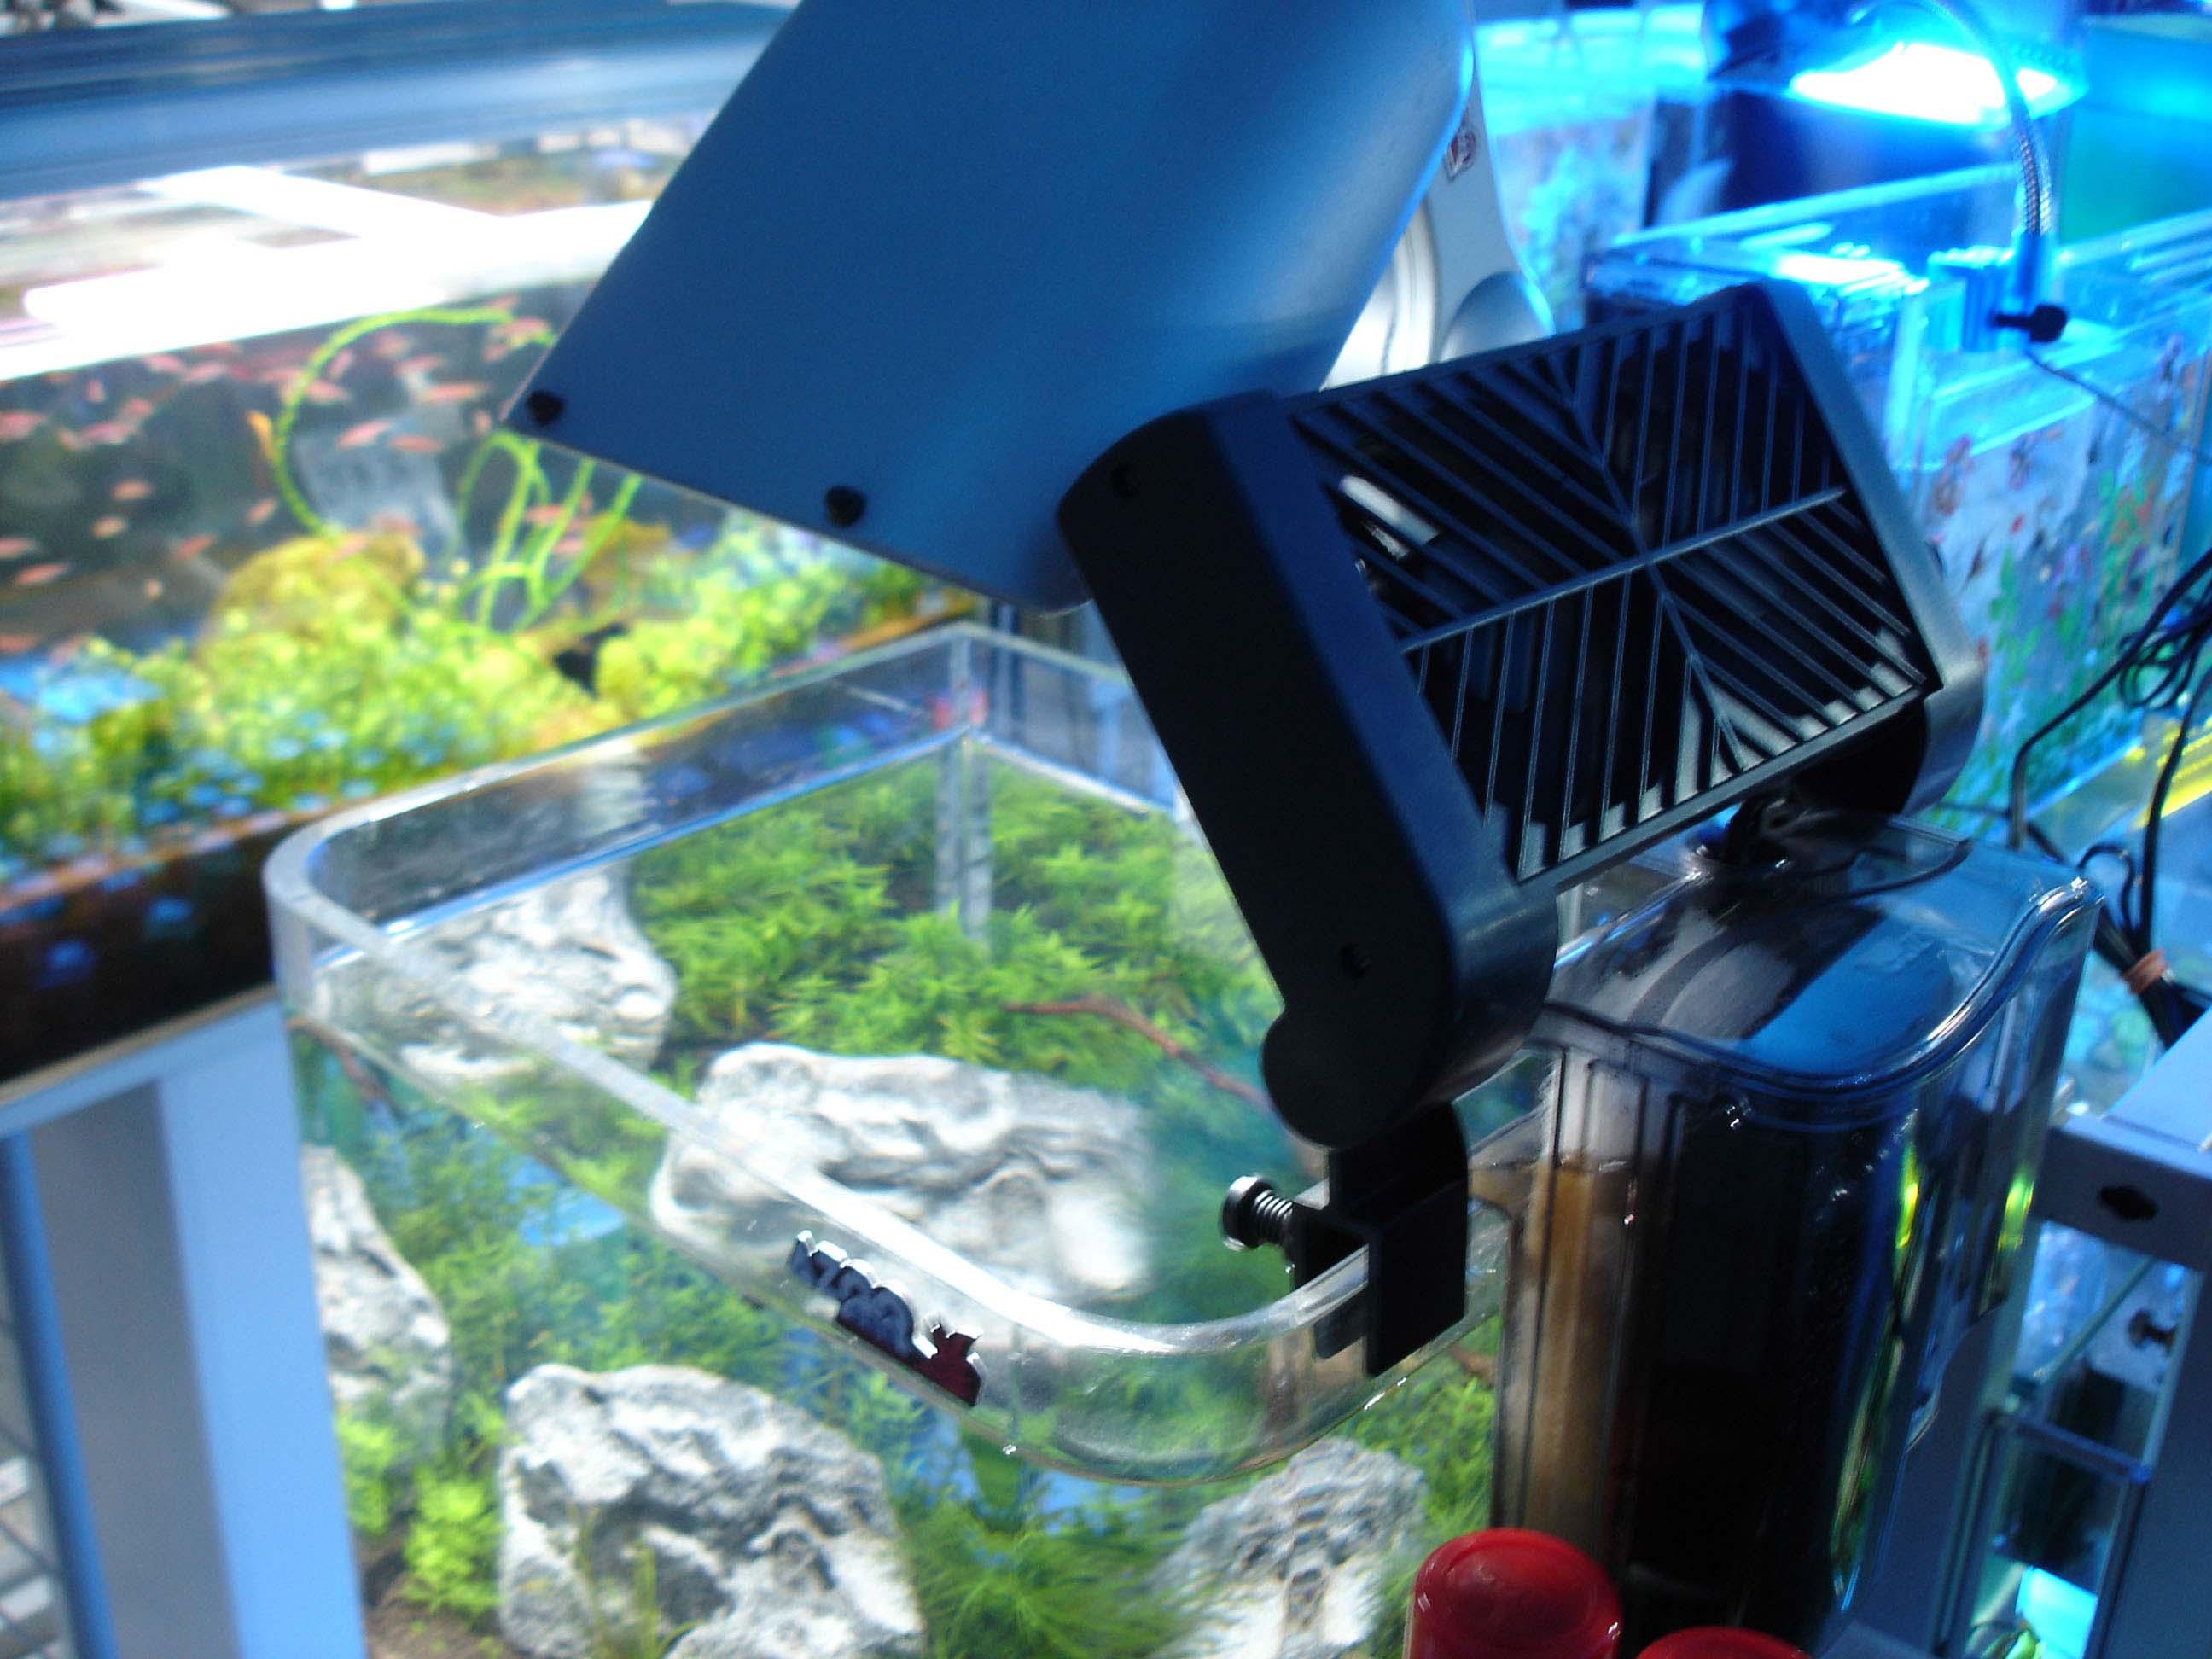 Aquarium fish tank cooling fan - Every Aquarium Needs A Fan